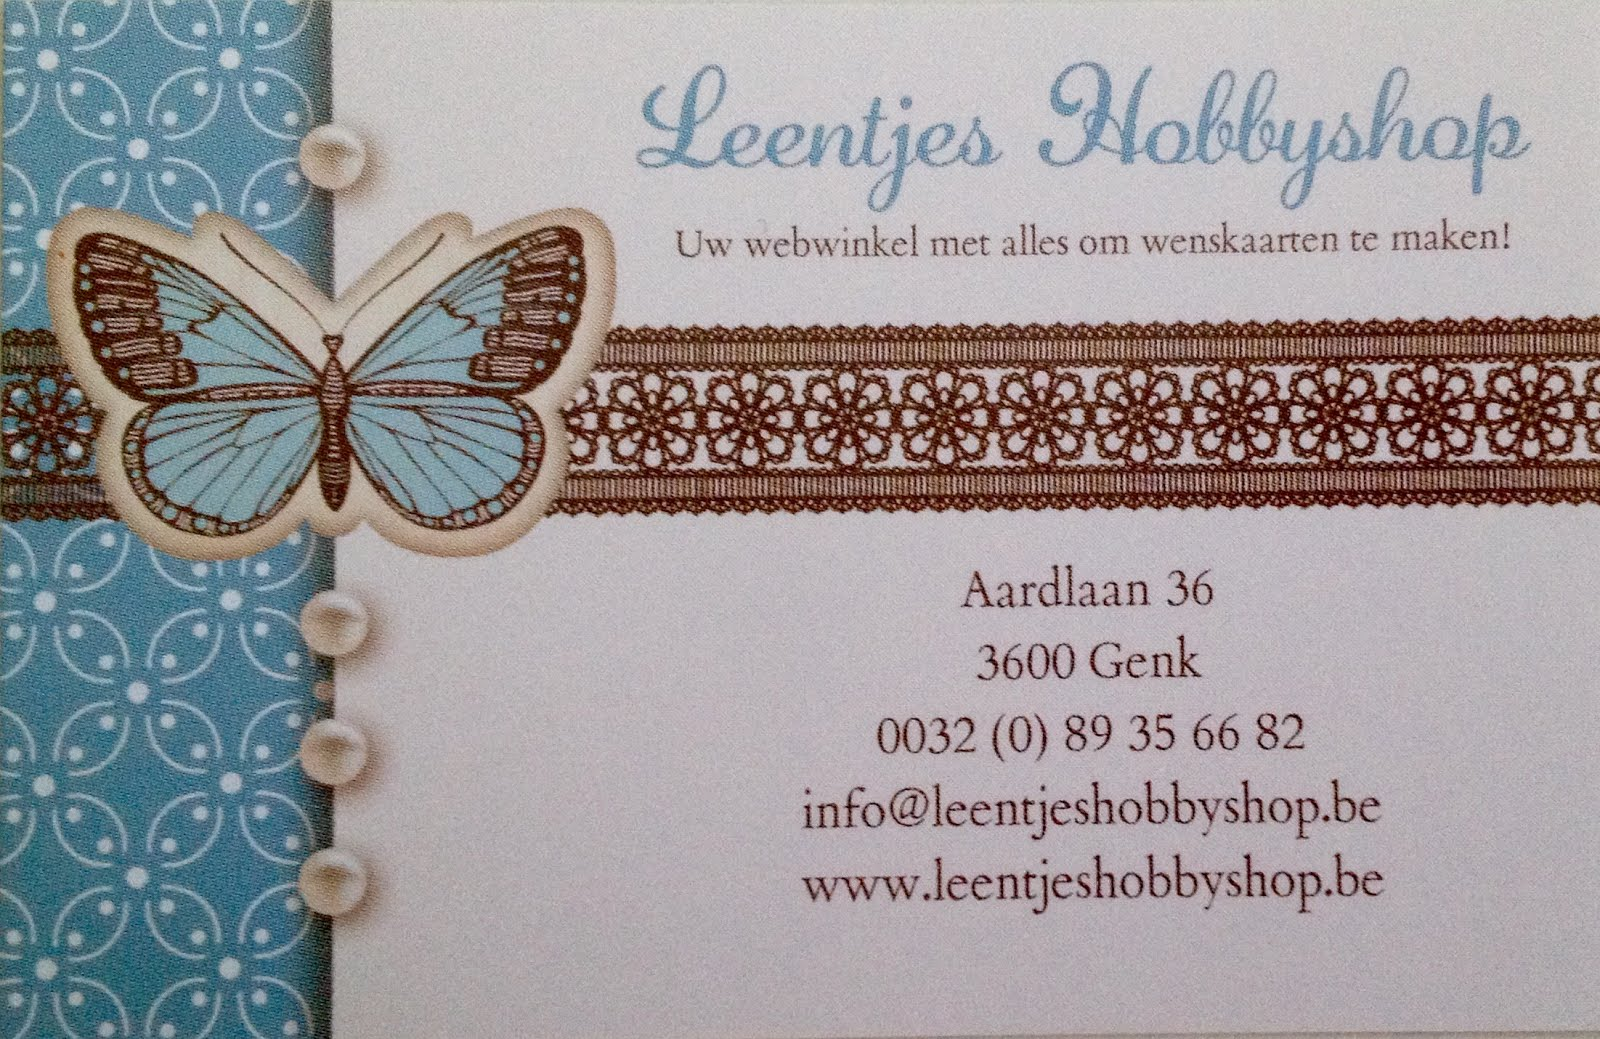 Webwinkel Leentjes Hobbyshop